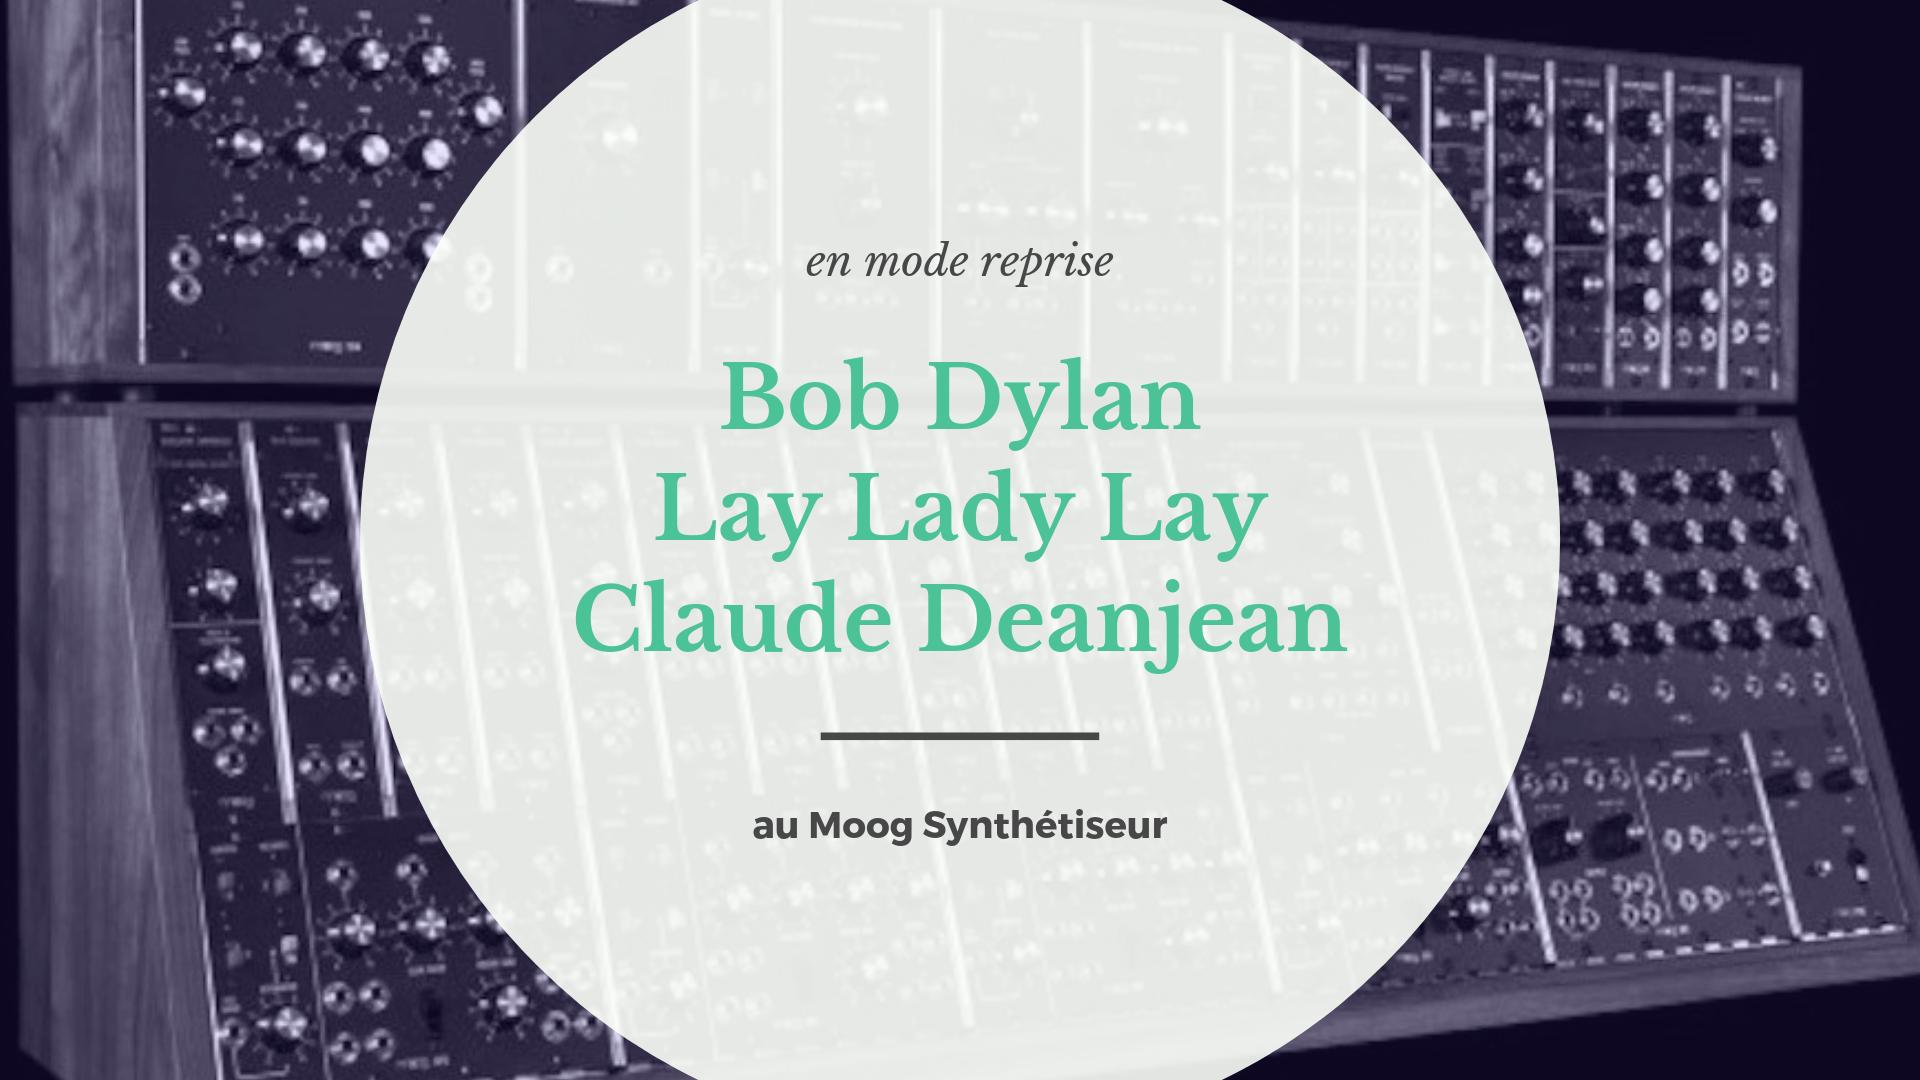 [En mode reprise] Bob Dylan – Claude Denjean – Lay Lady Lay…